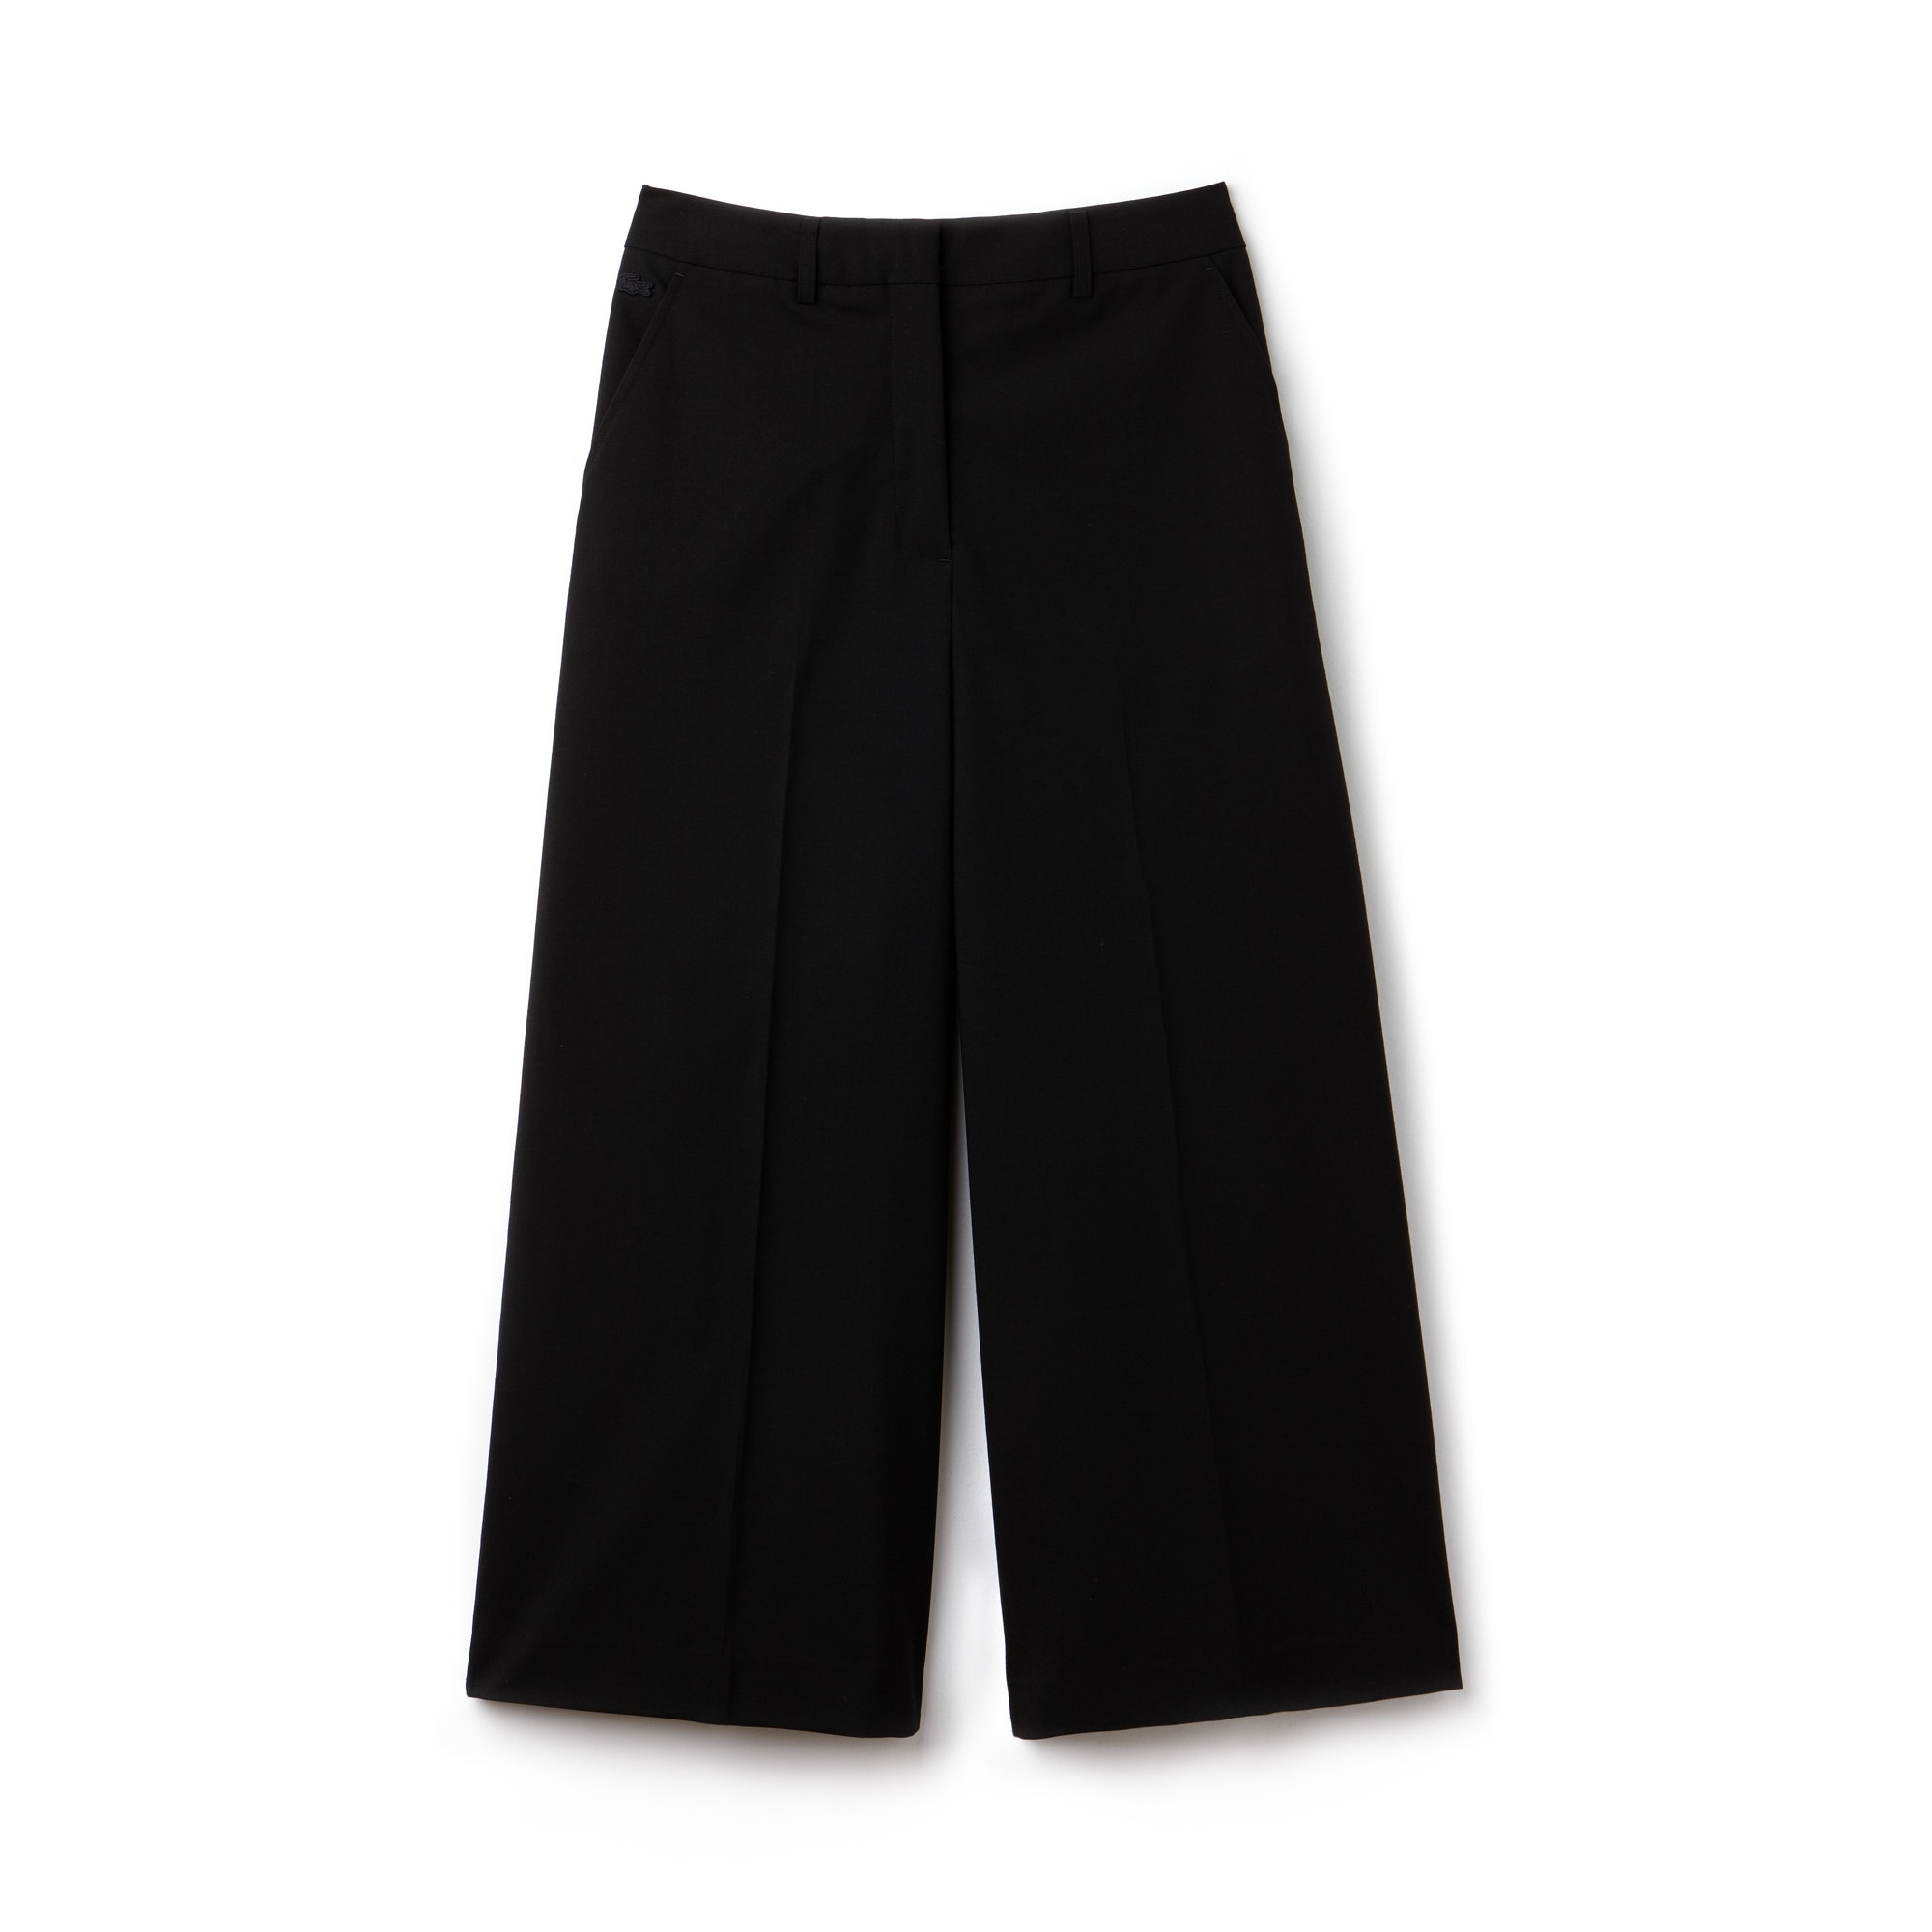 Gonna pantalone Lacoste LIVE in crêpe tinta unita